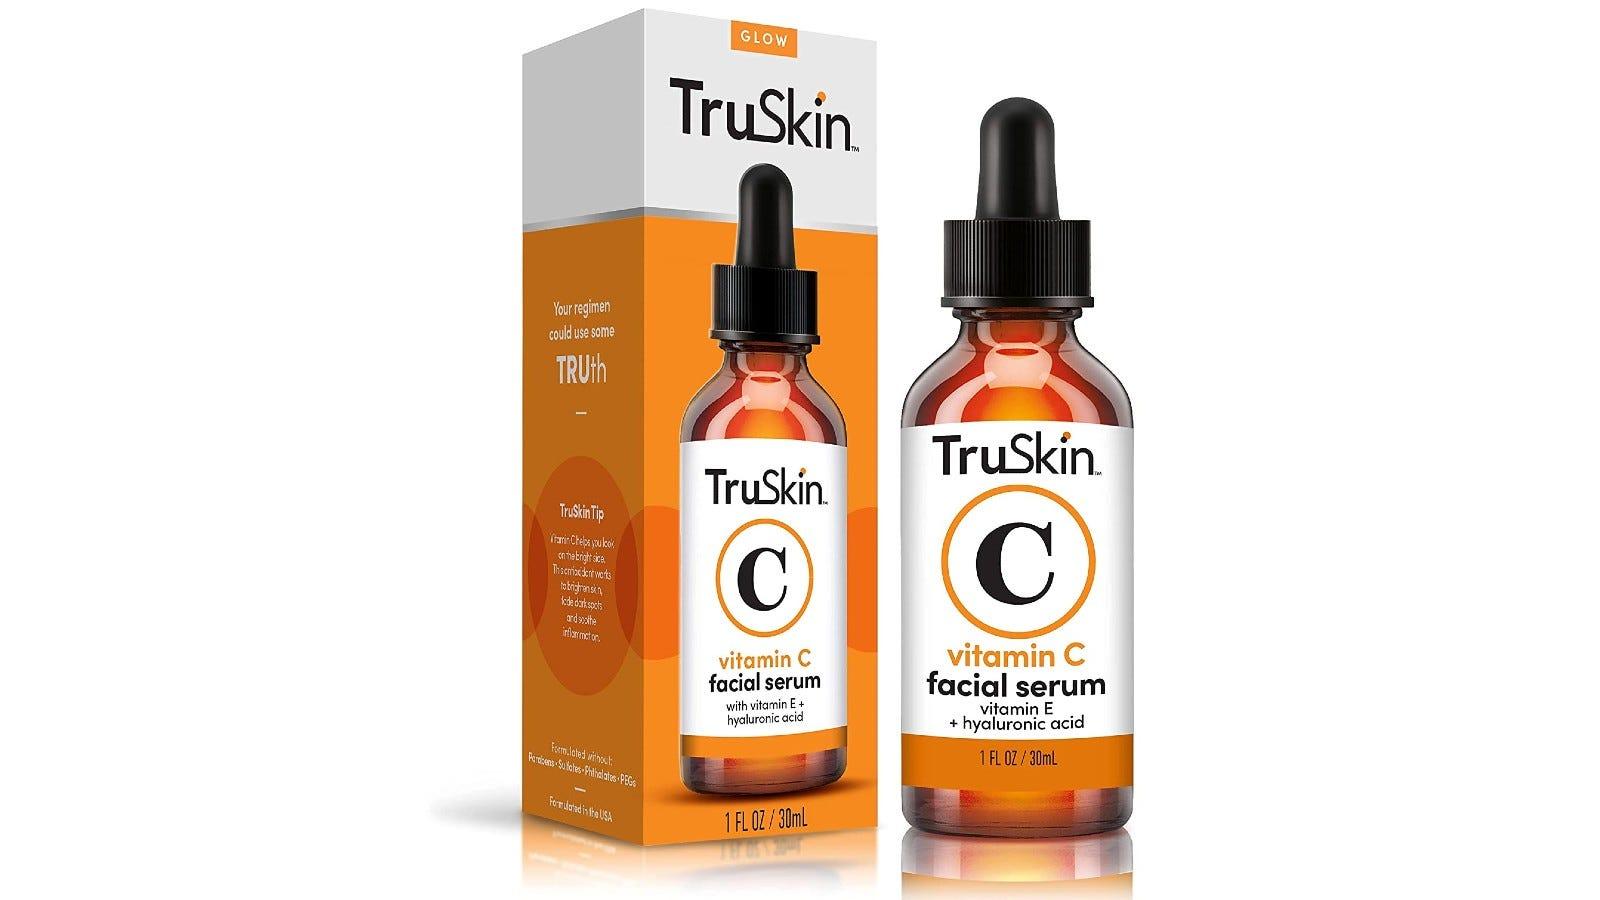 bottle of TruSkin serum next to the box